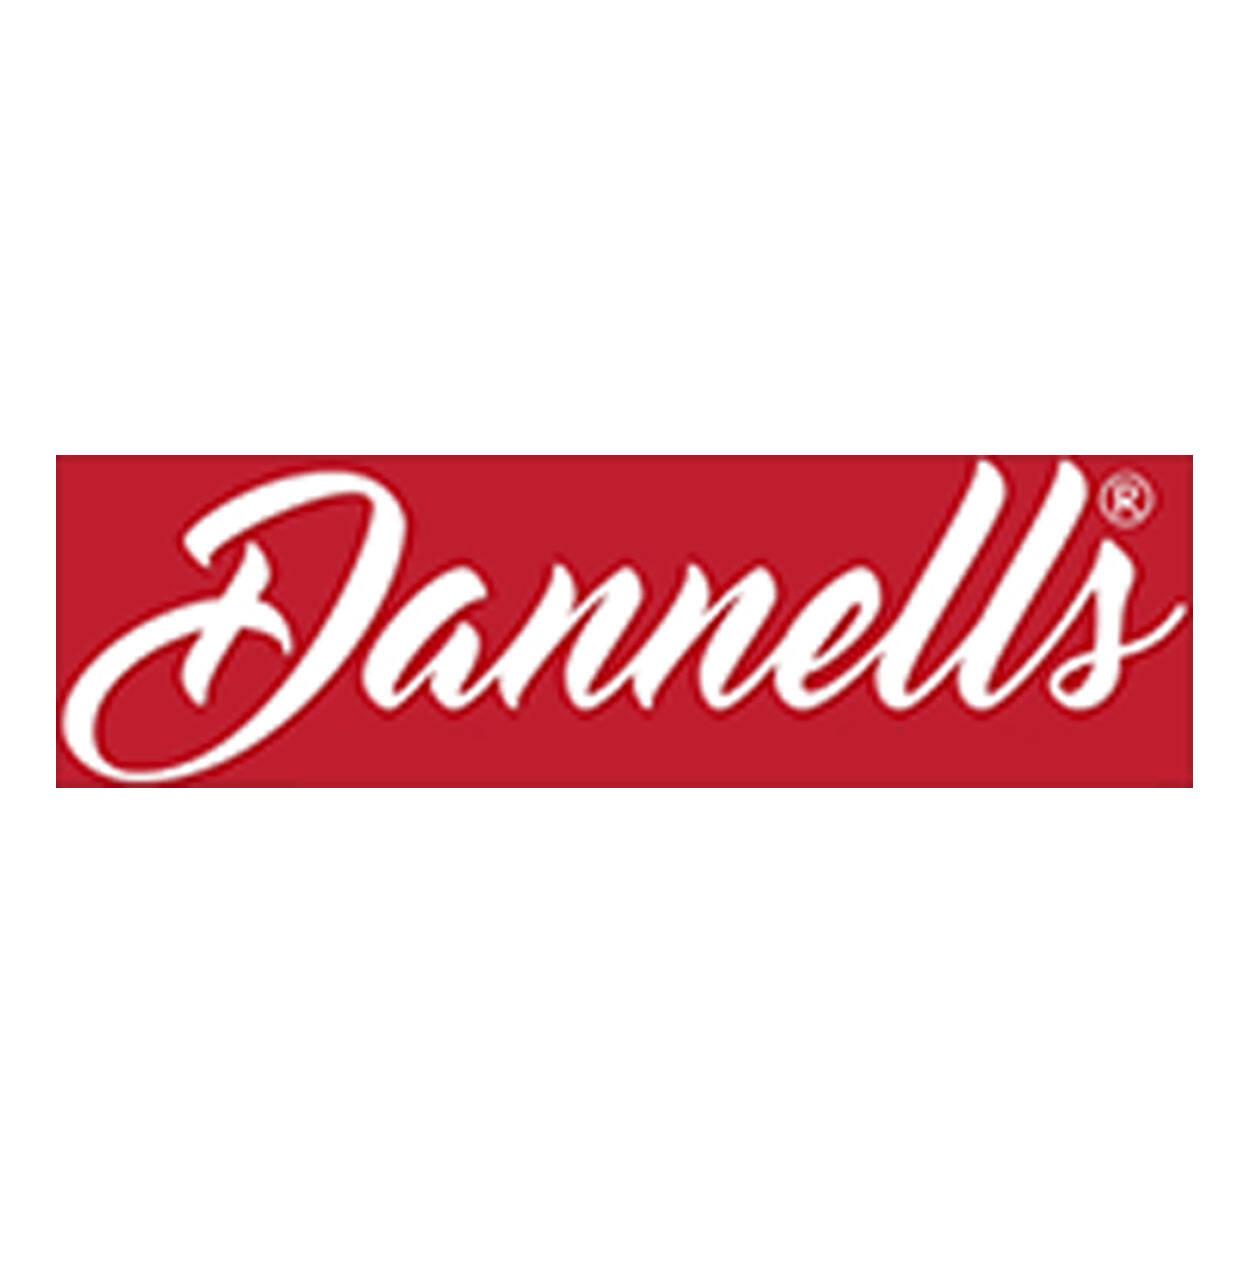 Dannells - Need Craft